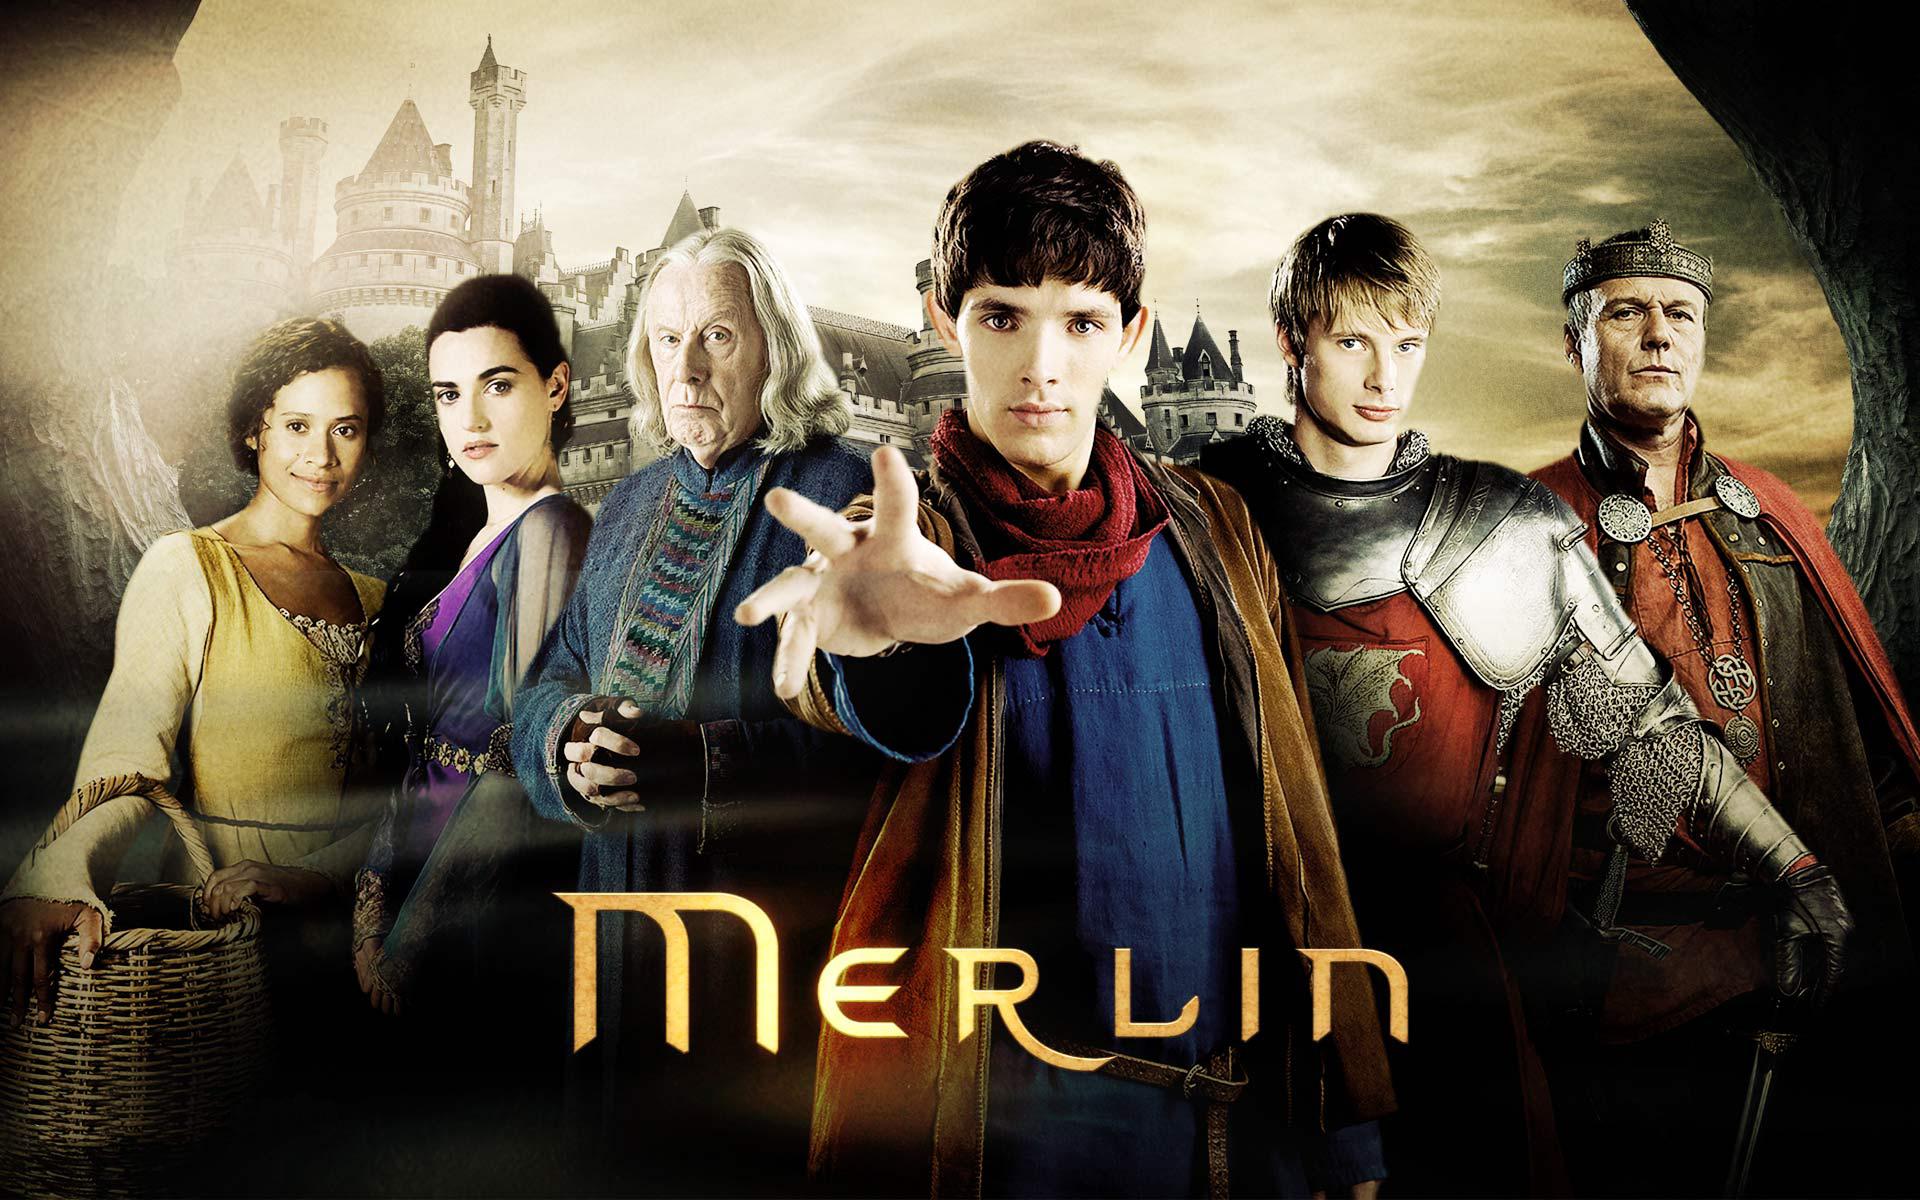 http://www.freelyspeaks.com/wp-content/uploads/2013/10/Merlin.jpg